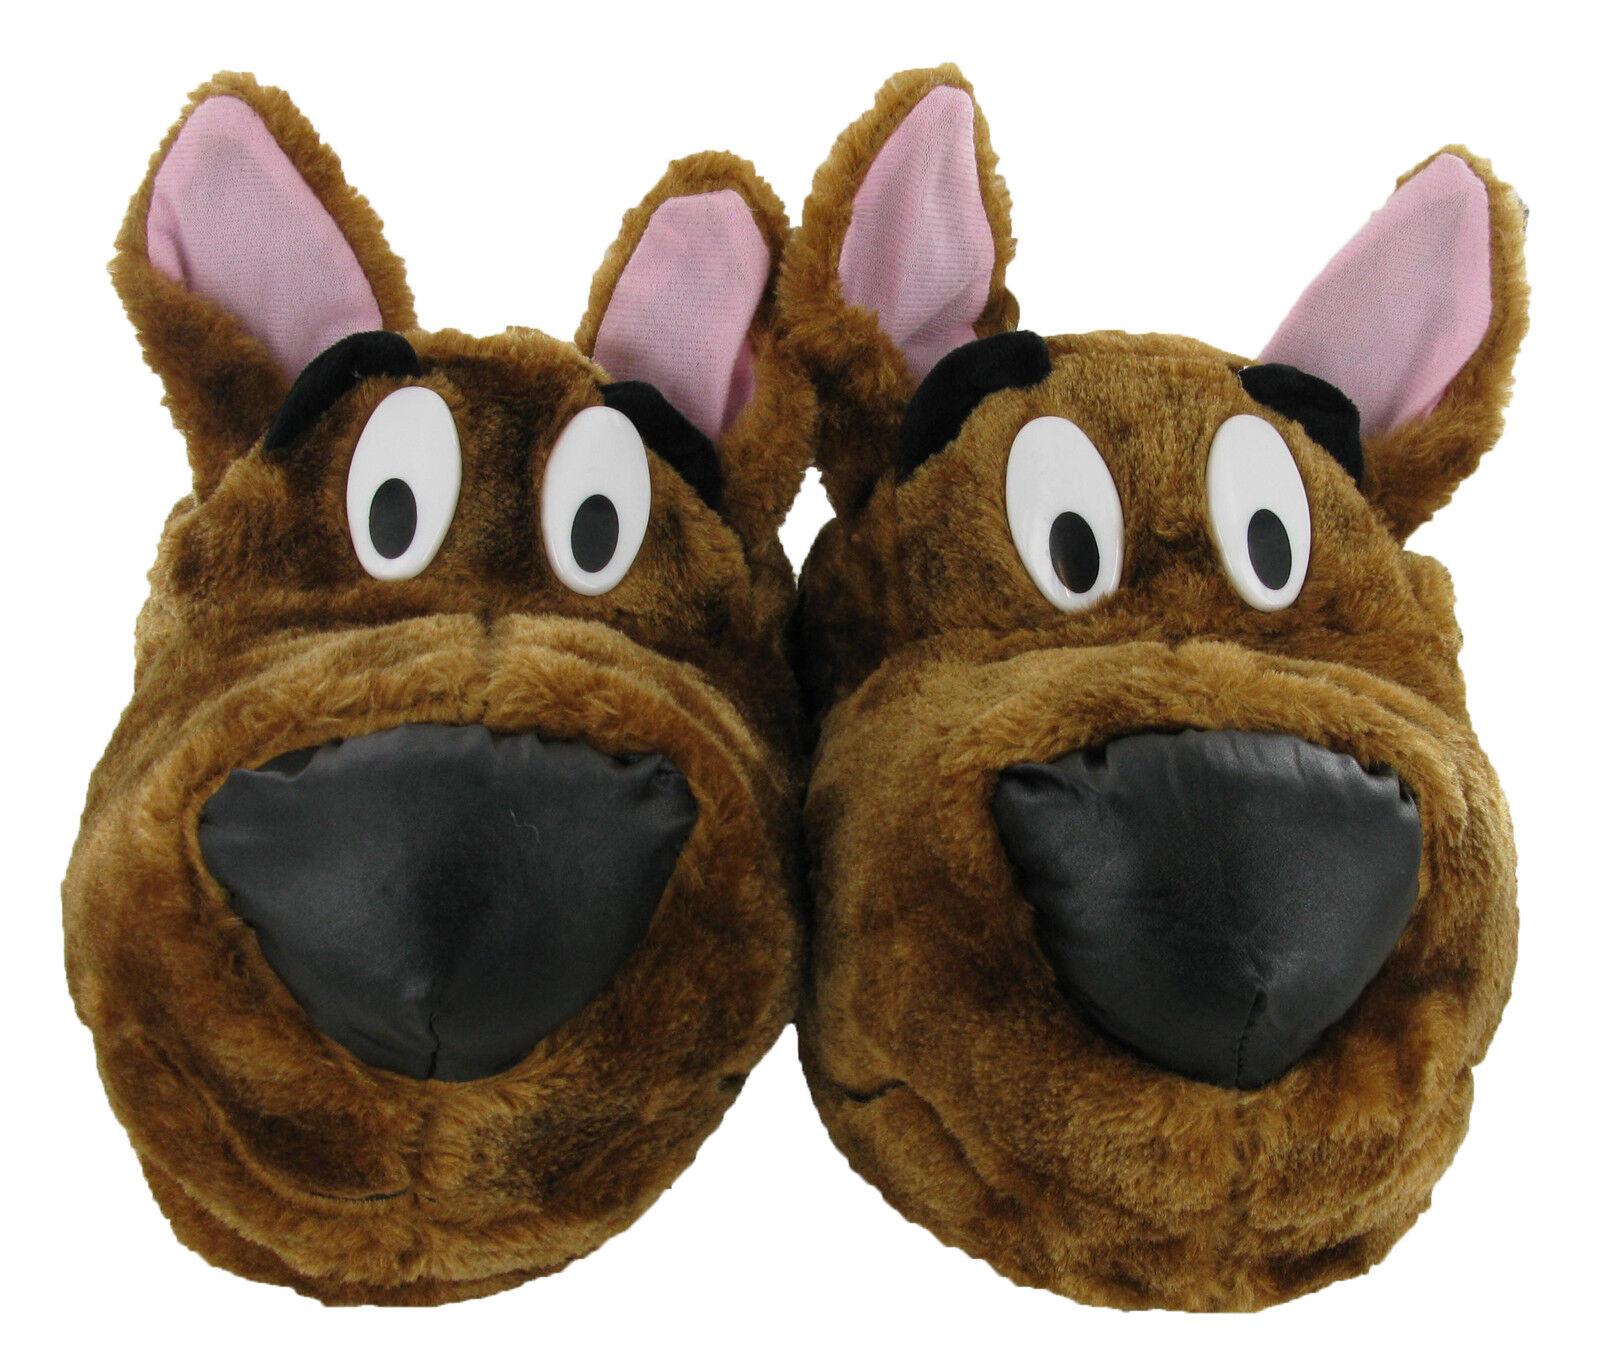 Herren Scooby-Doo Neuheit Braun Warm Flauschig Hausschuhe Größe UK 7-12